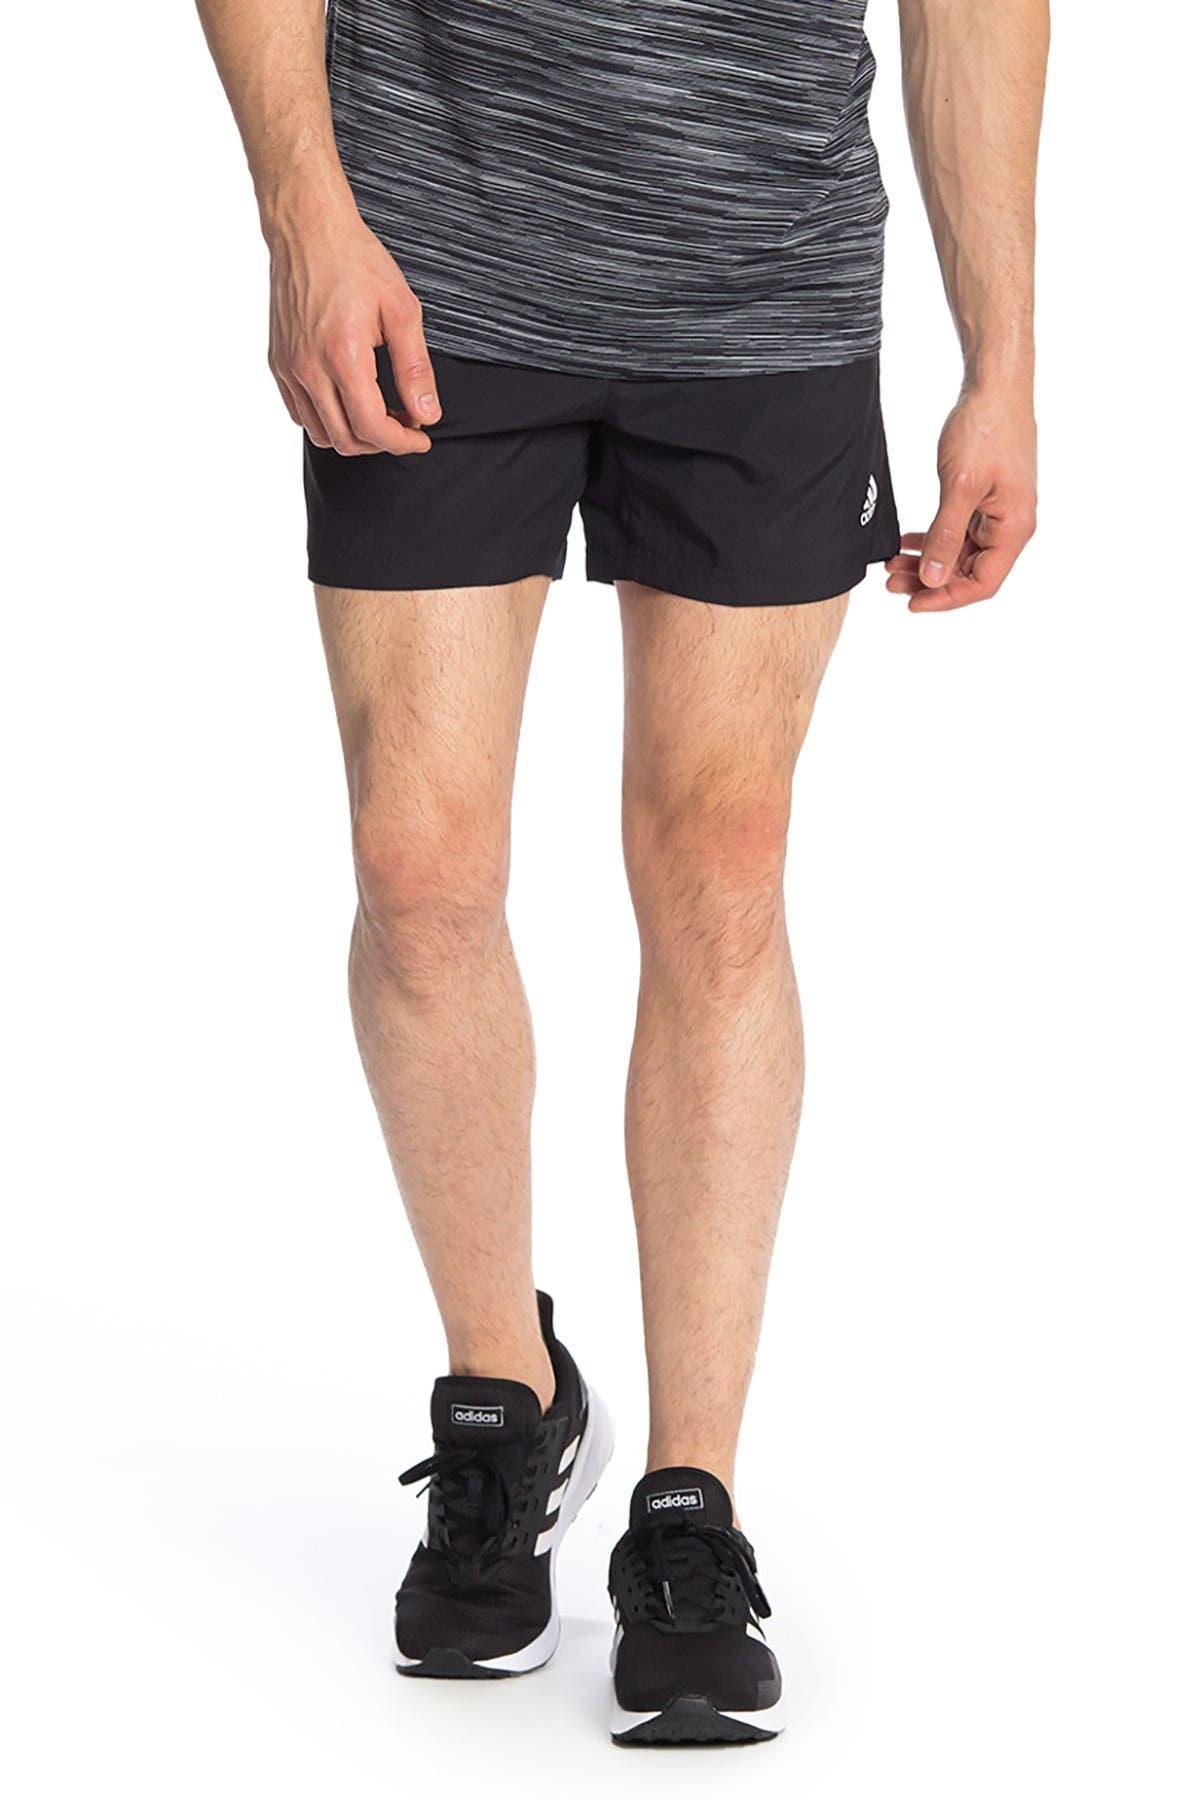 Image of adidas Own The Run Shorts